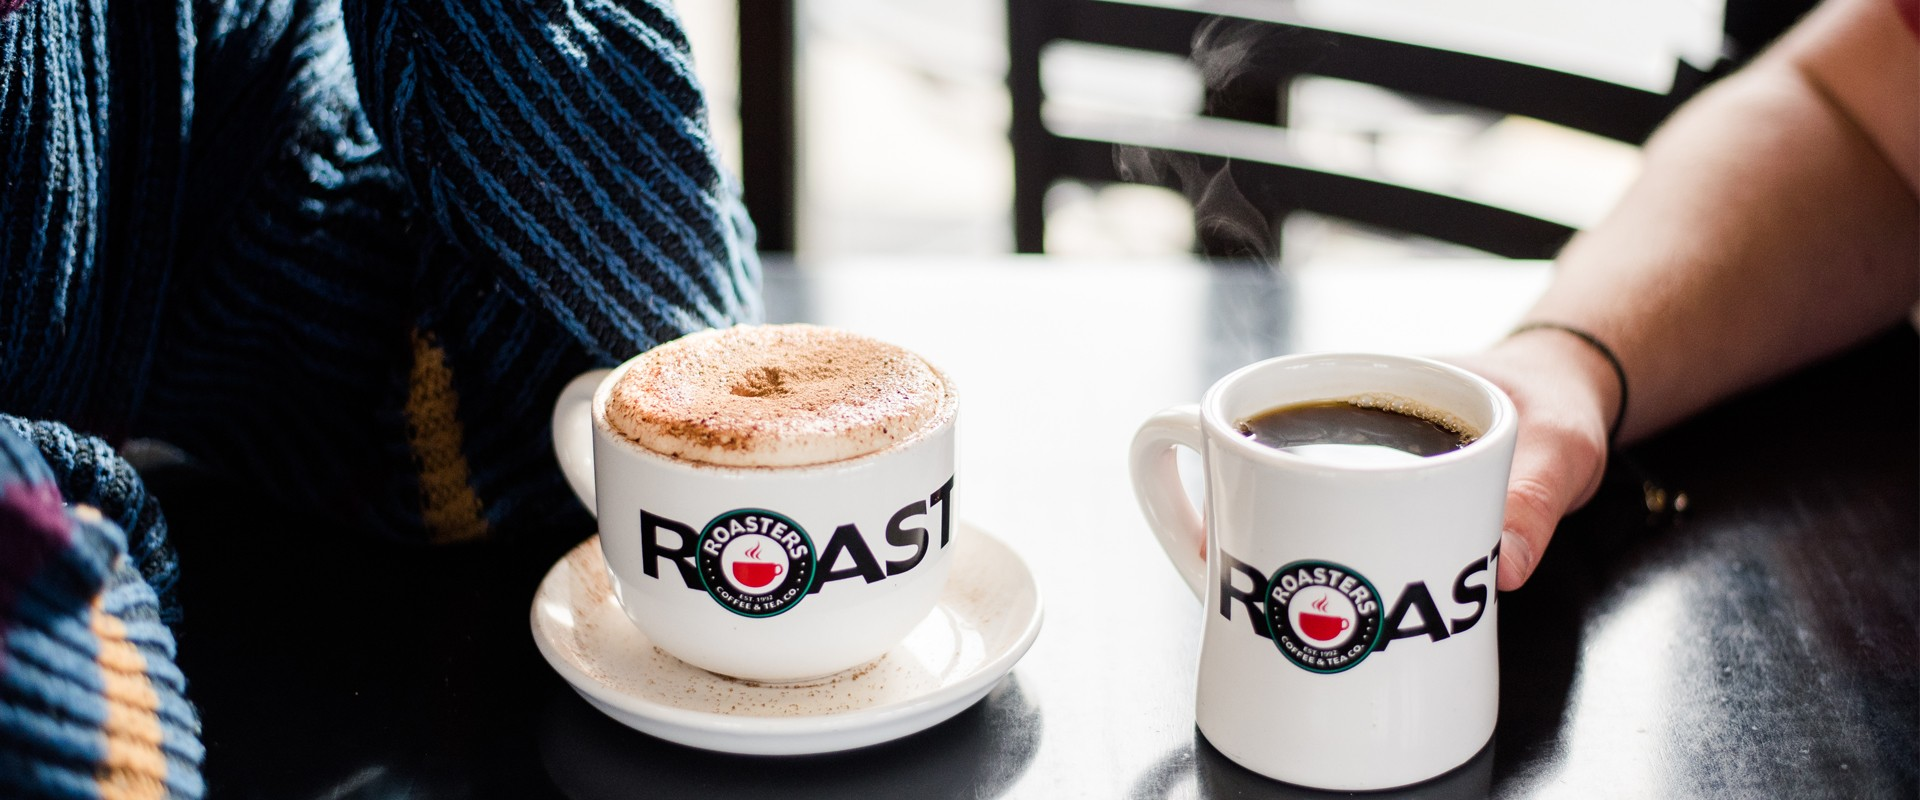 Roasters Coffee & Tea Co